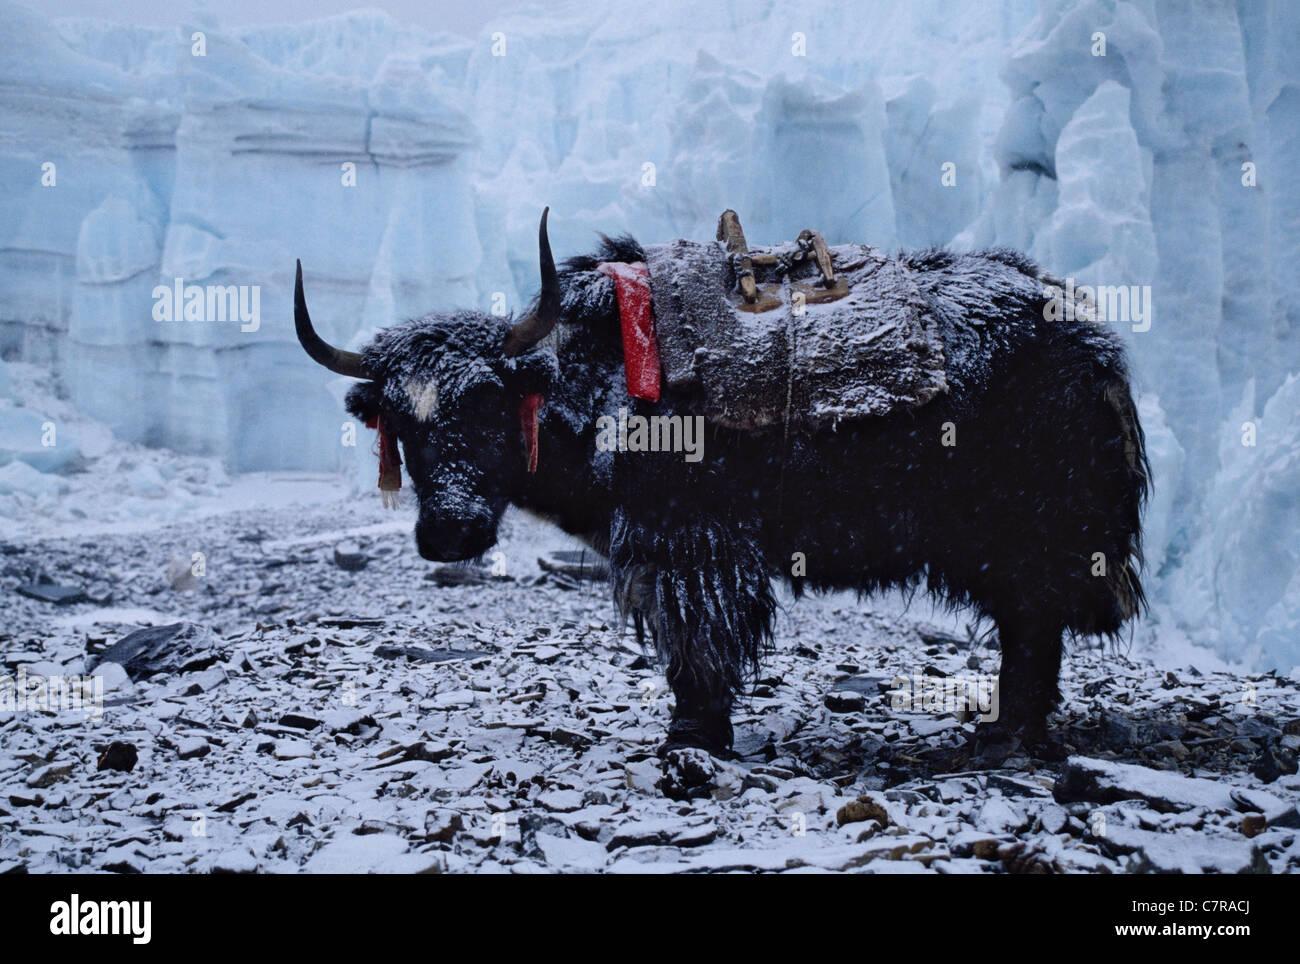 Himalayan yak in Rongbuk Glacier, Tibet, China - Stock Image